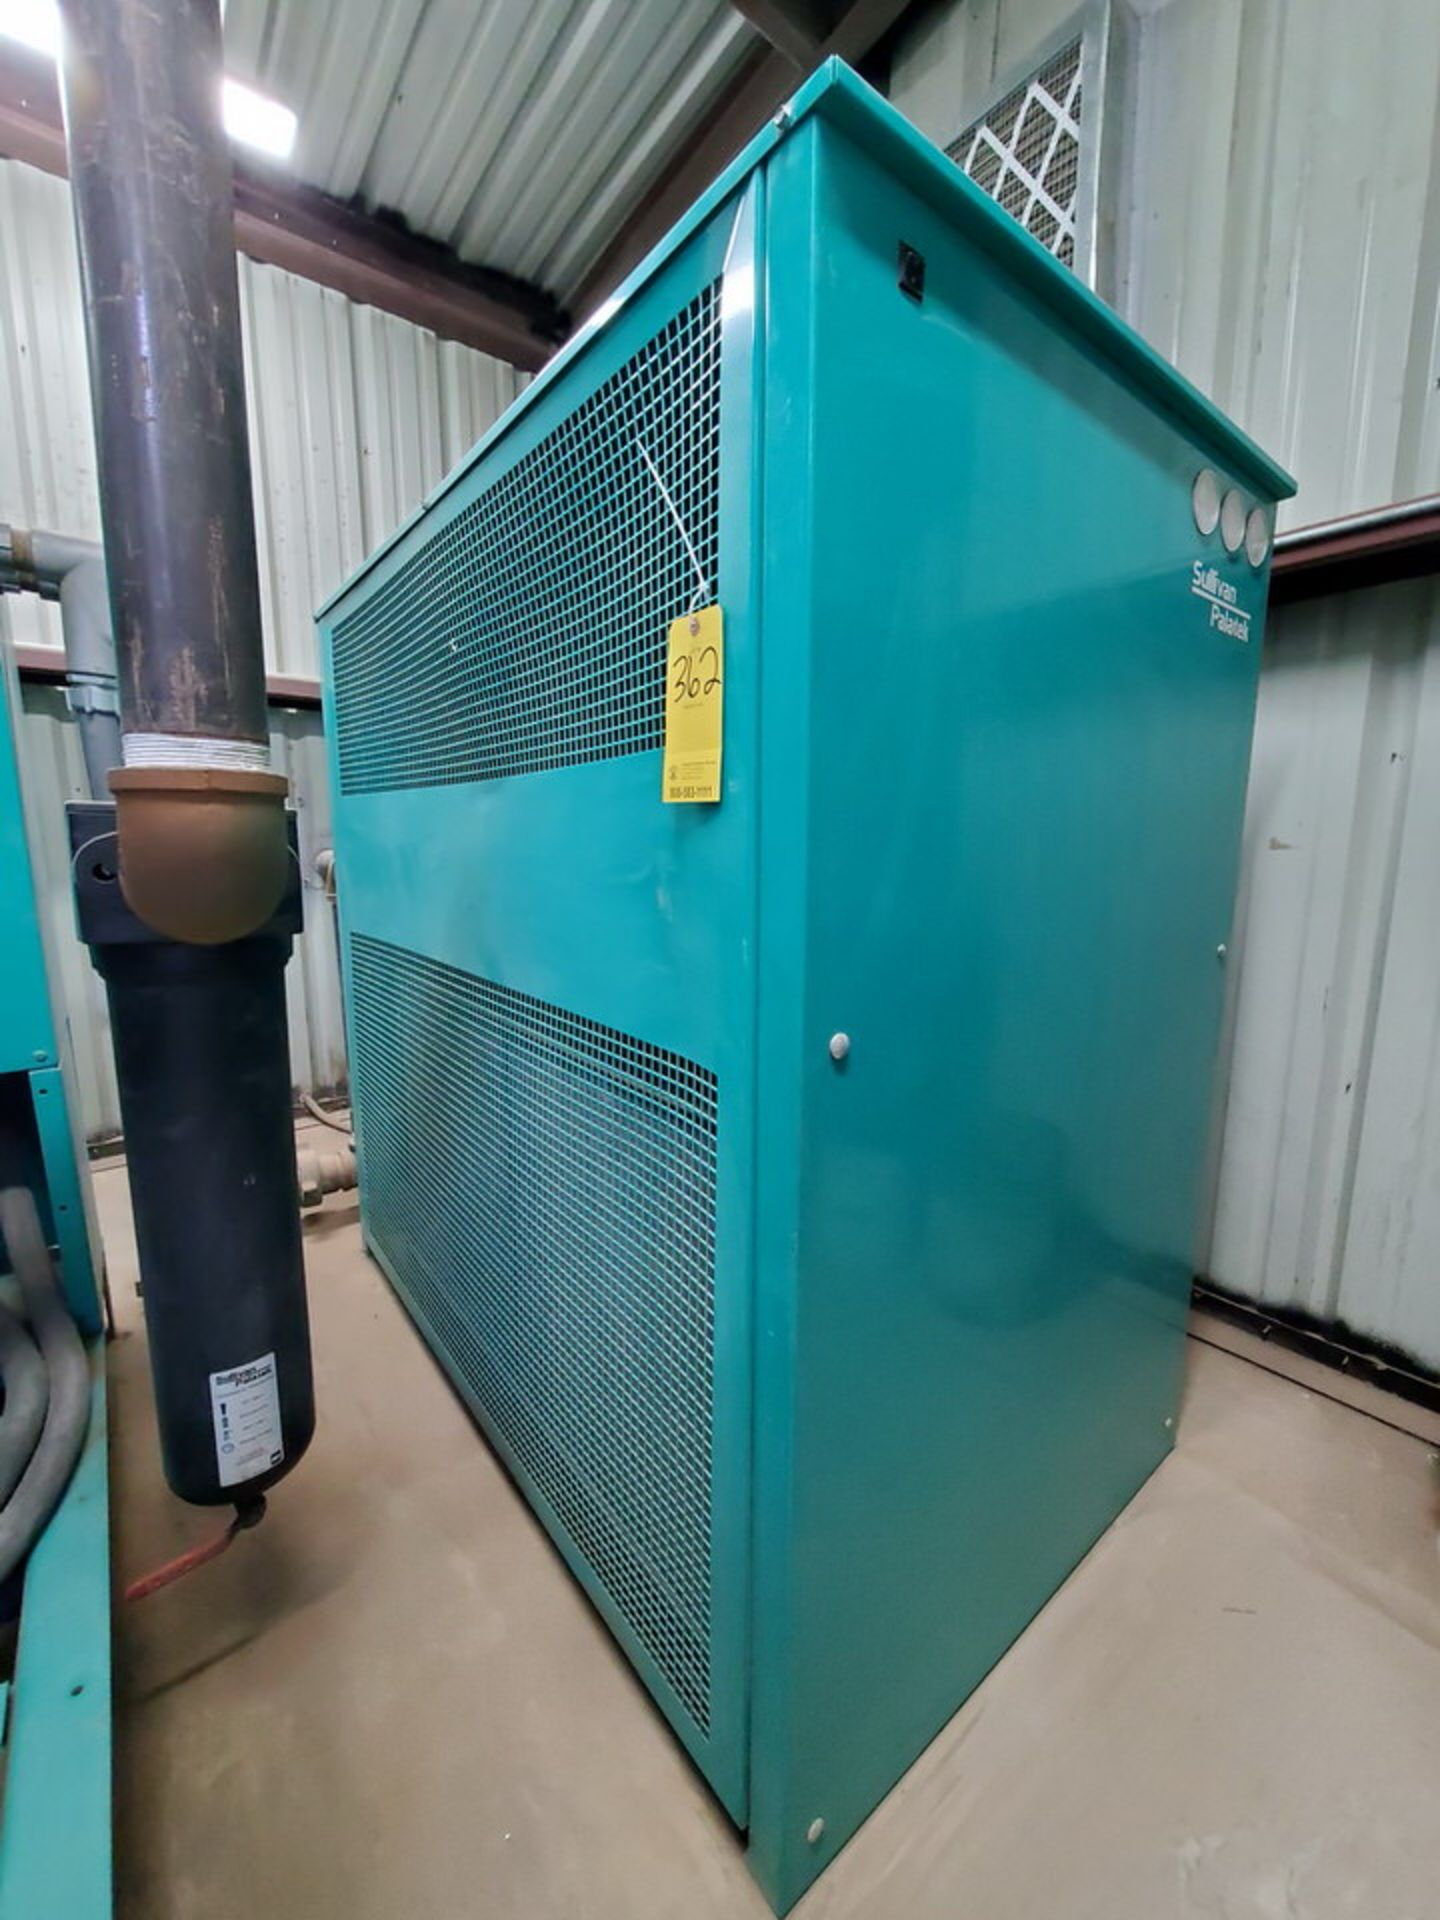 2017 Sullivan Palatek SPRF-1175A-436 Air Dryer 460V, 11.8A, 5HP, 150psi